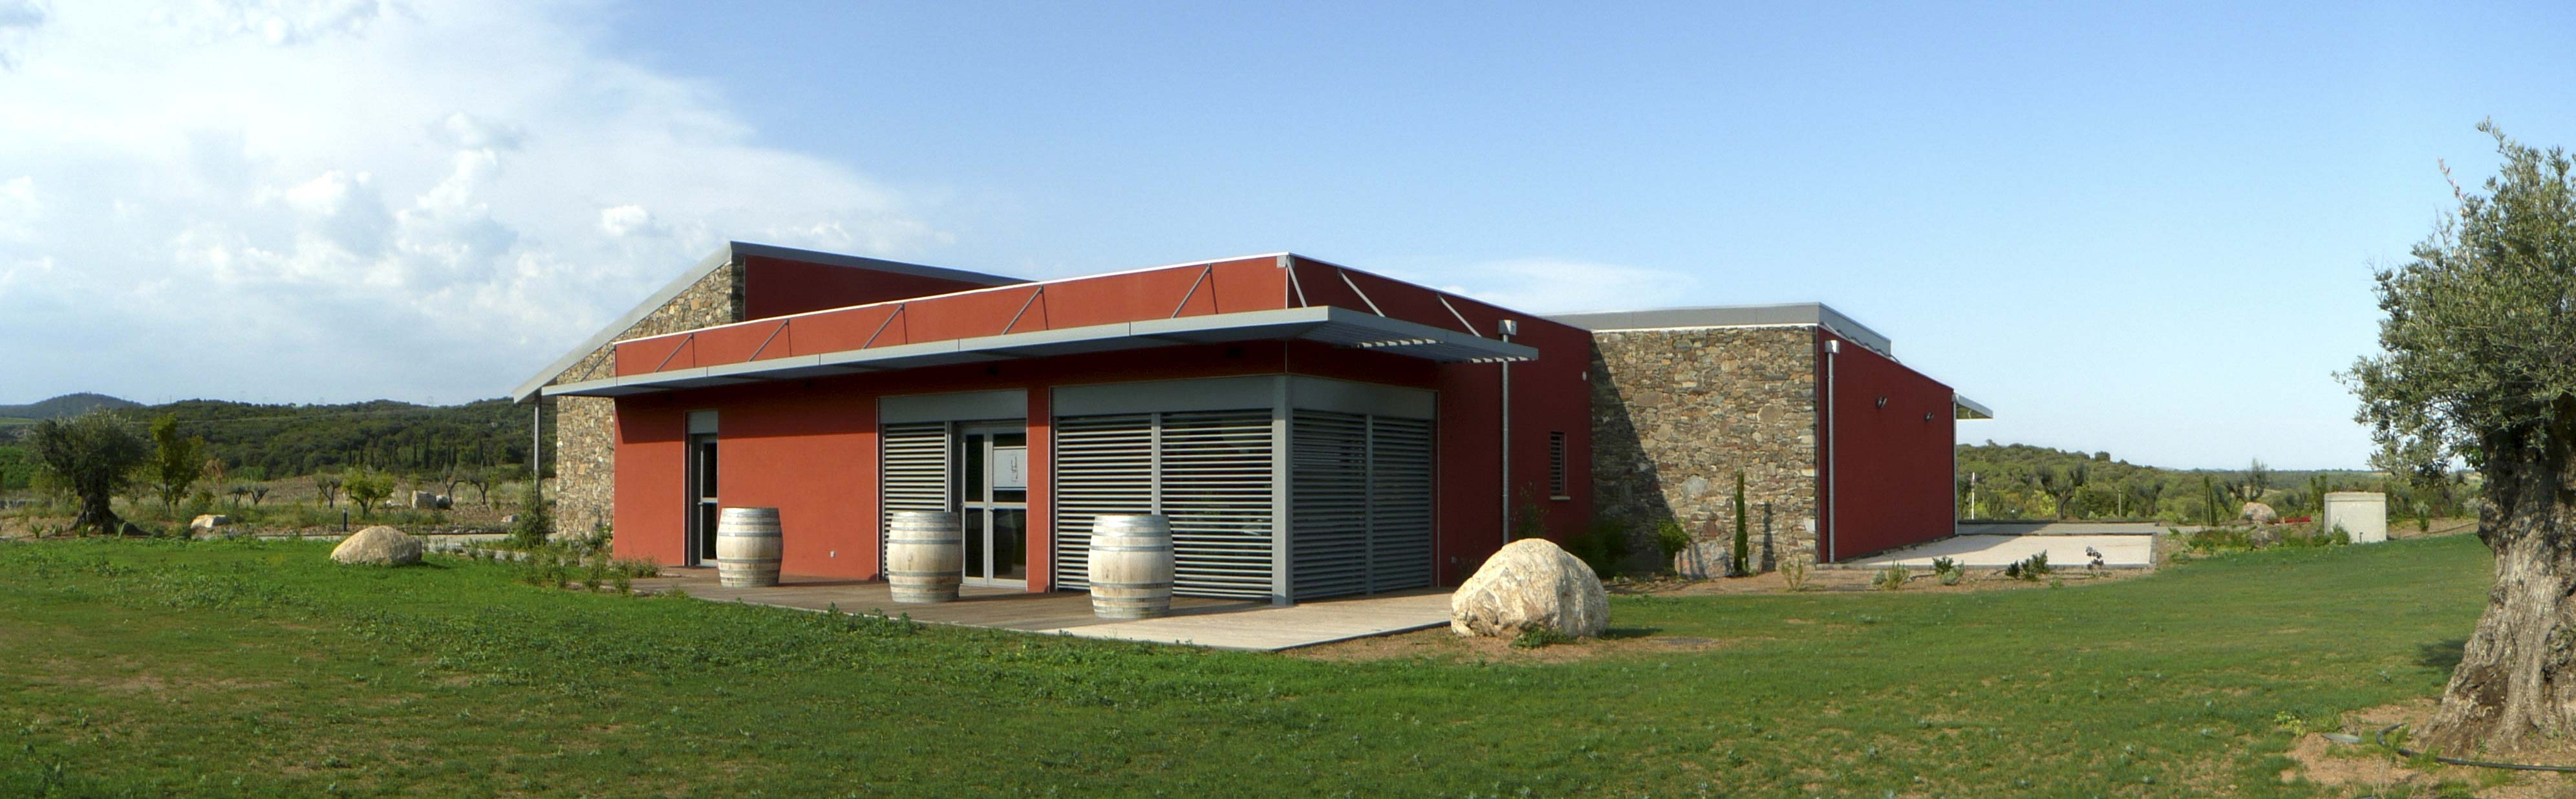 Mas Gabinele Hérault BF Architecture viticole 4